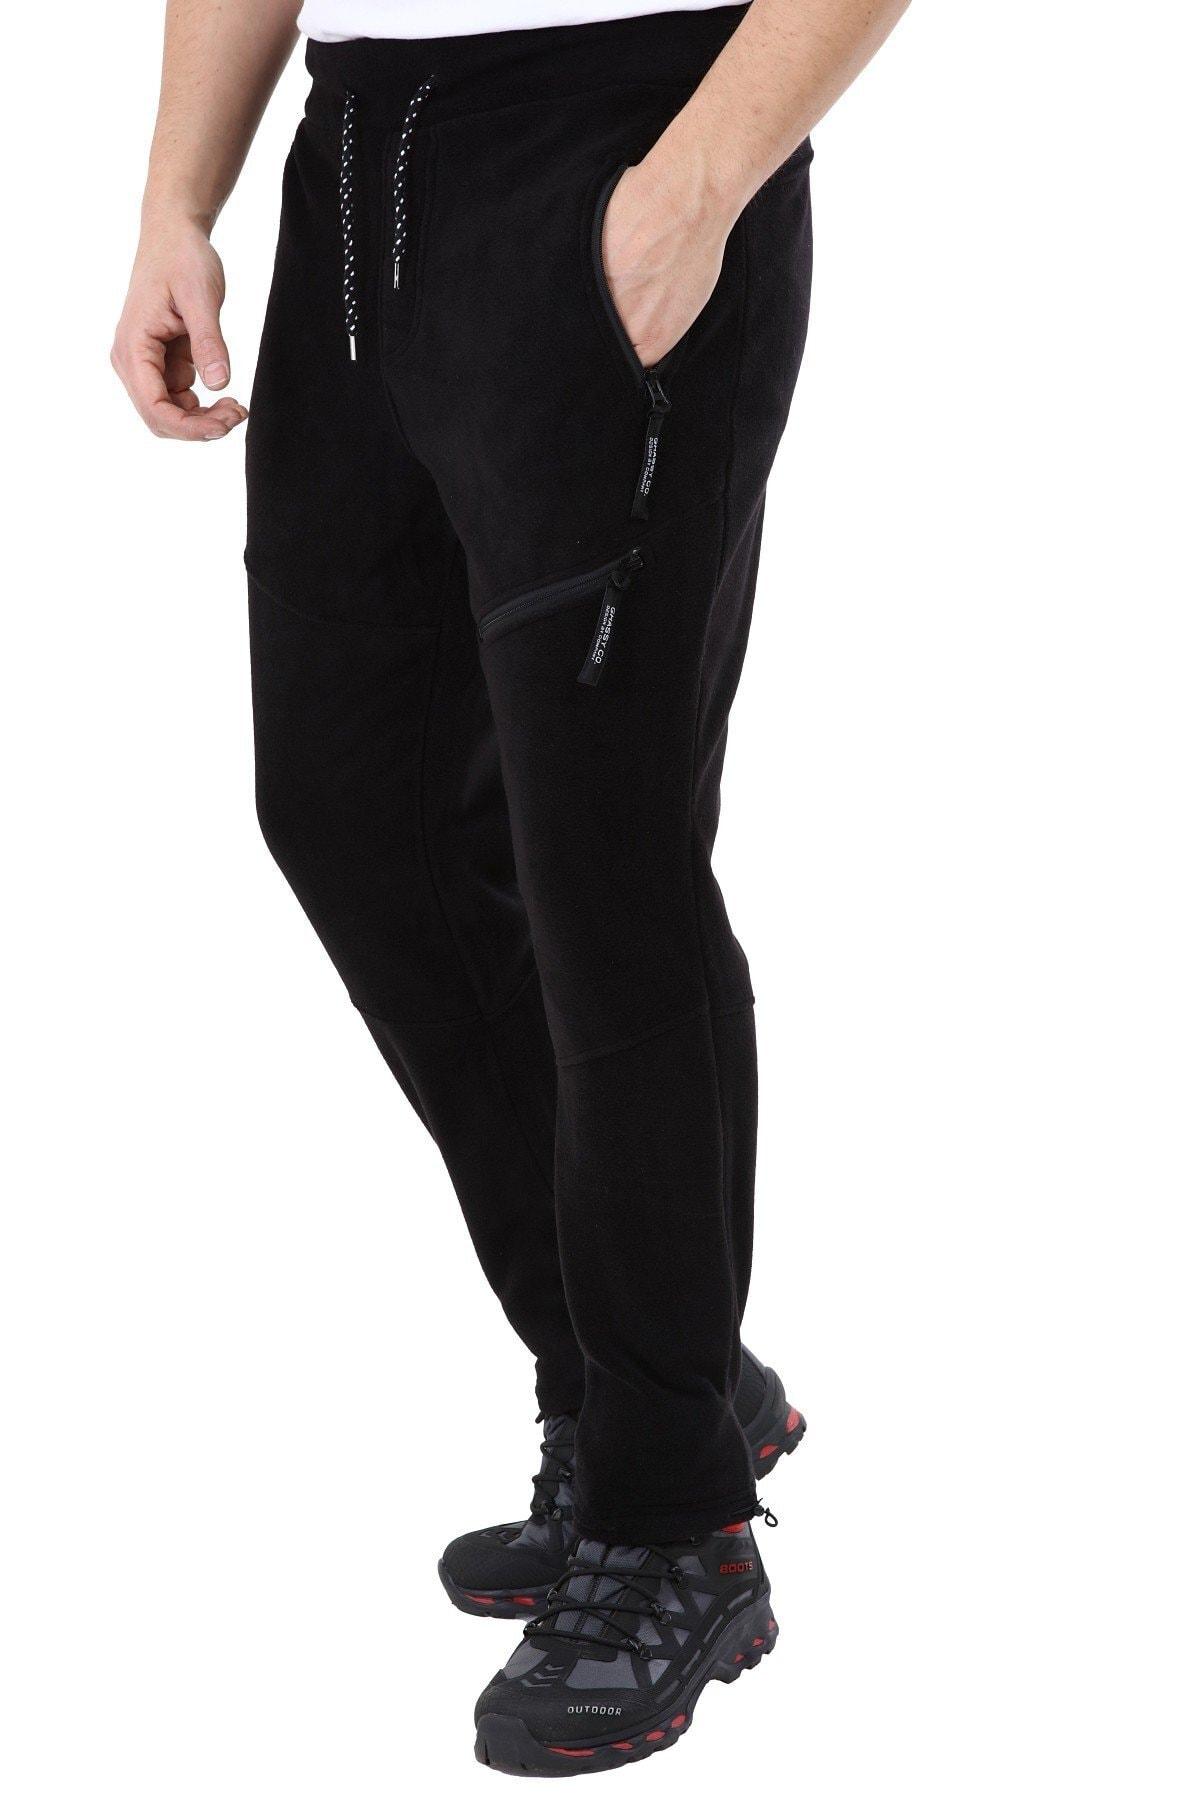 GHASSY CO. Erkek Siyah Taktik Cepli Outdoor Polar Pantolon 2